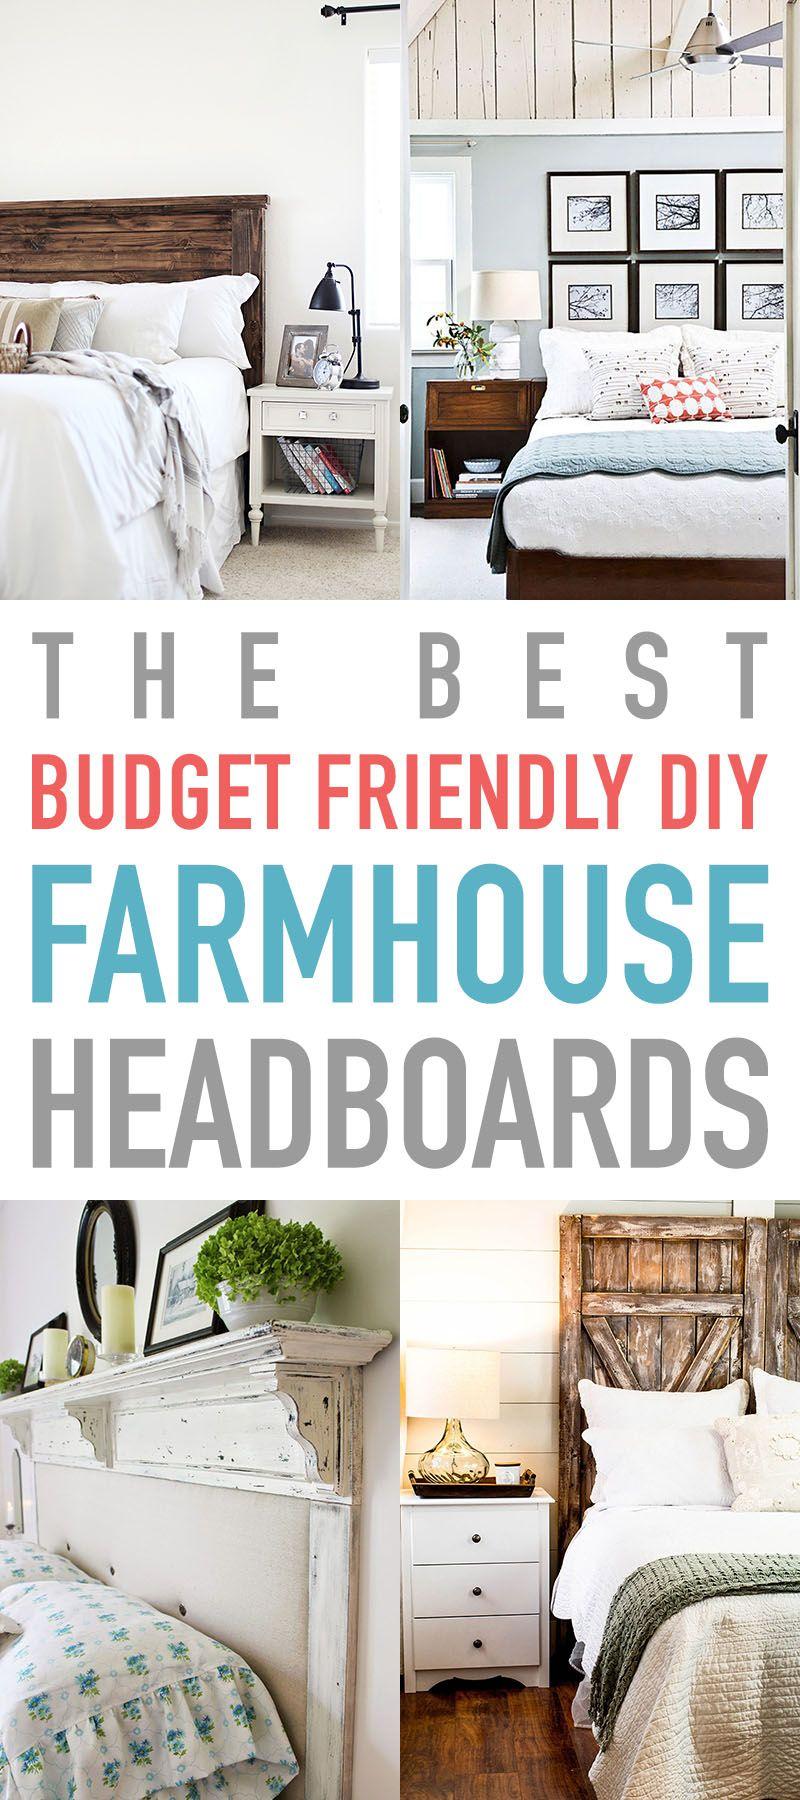 Budget Friendly Diy Home Decorating Ideas Tutorials 2017